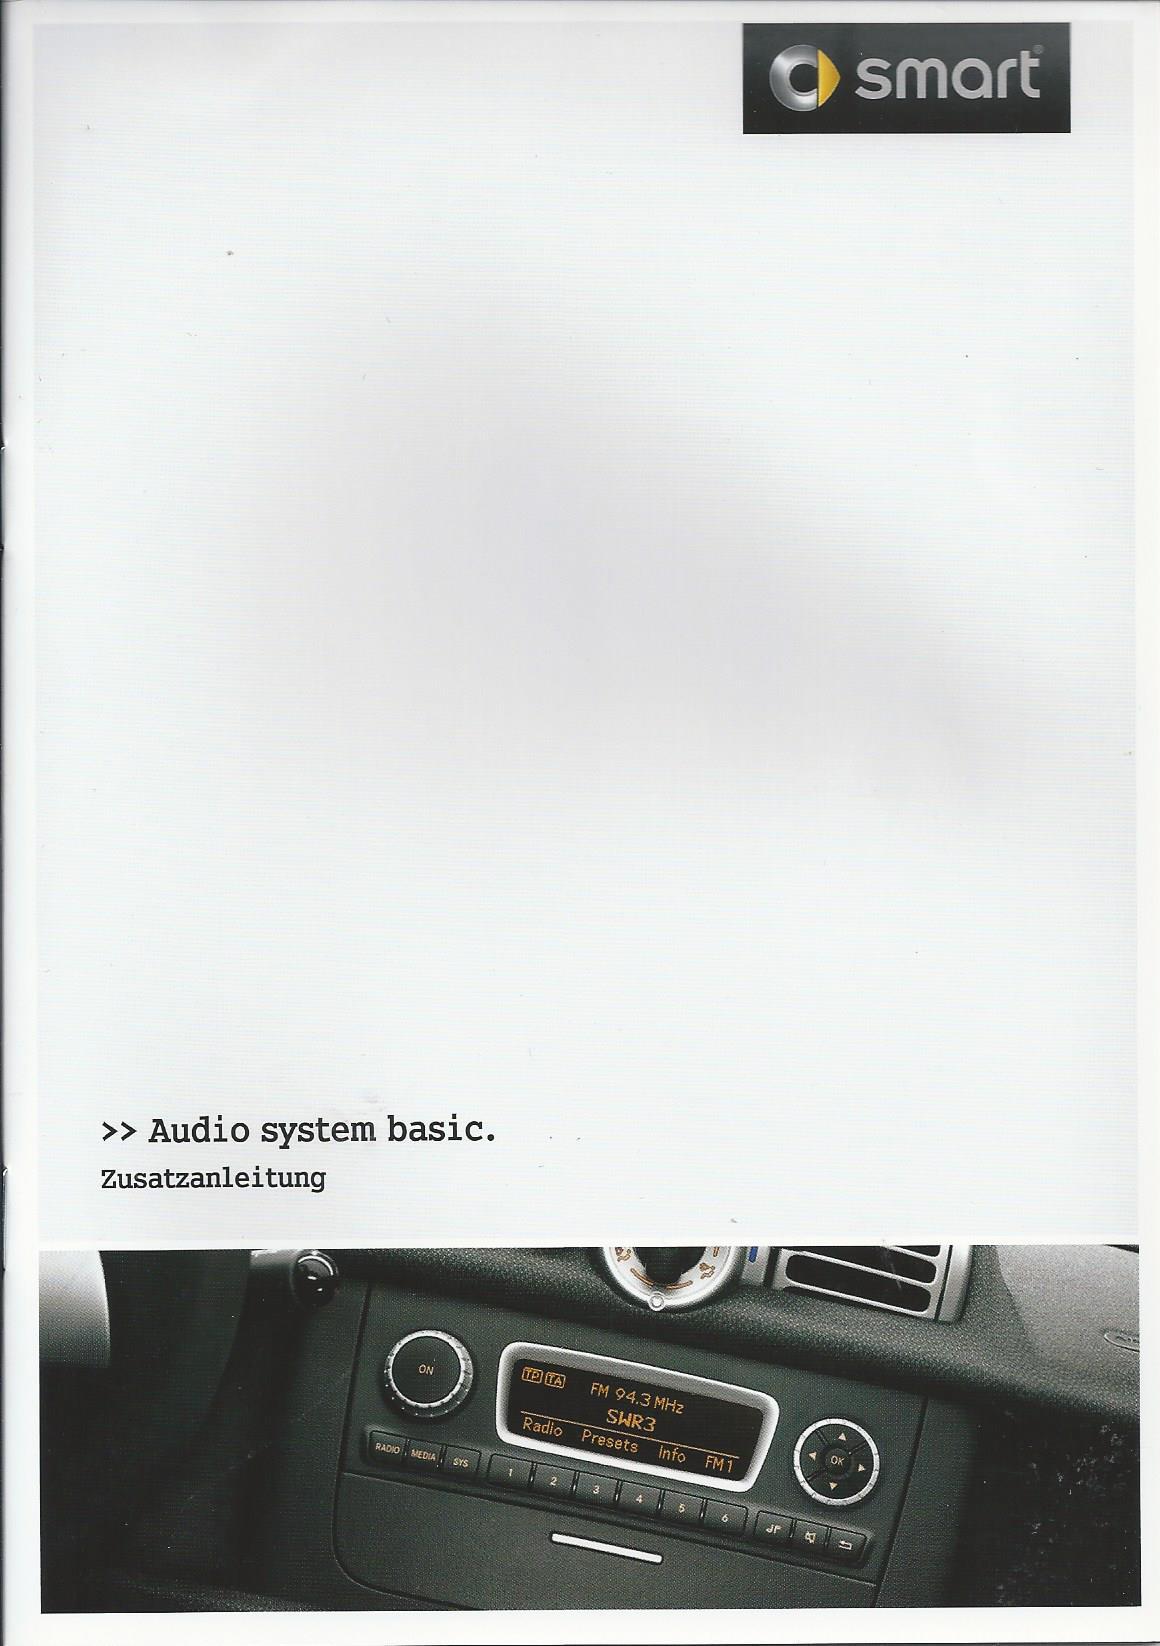 smart audio system basic 2012 betriebsanleitung handbuch bordbuch rn ebay. Black Bedroom Furniture Sets. Home Design Ideas